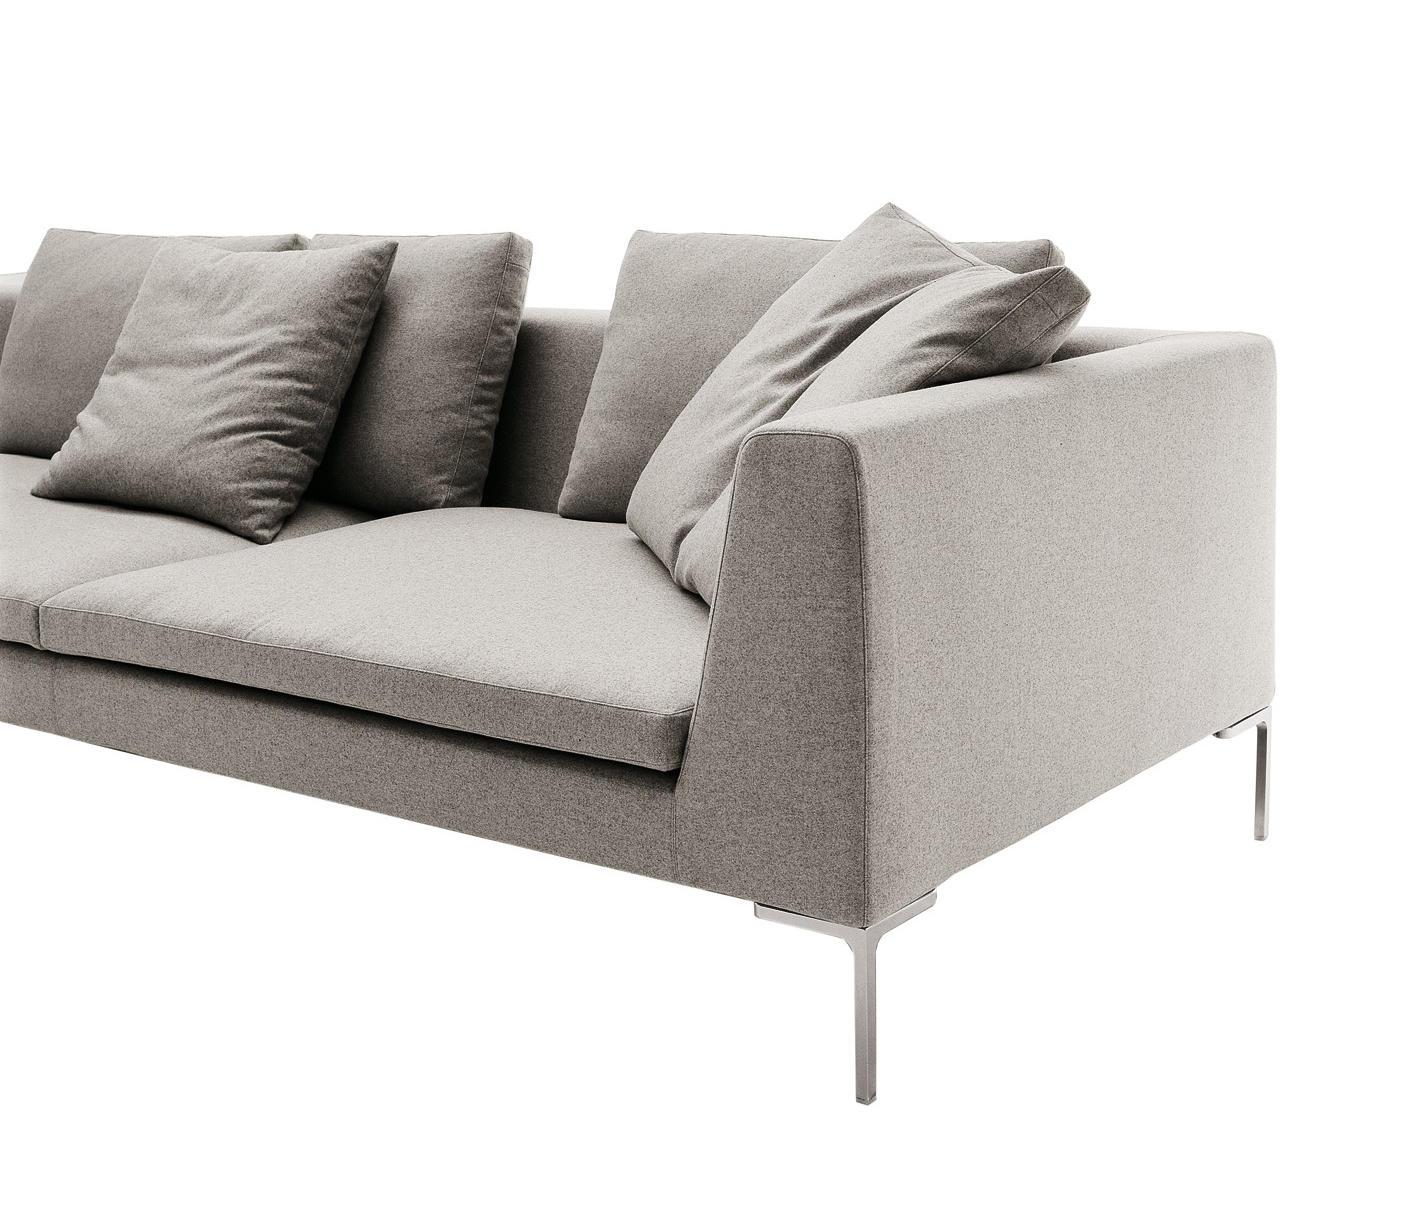 Charles Large Chl135ls Chl158d Sofas From B B Italia Architonic